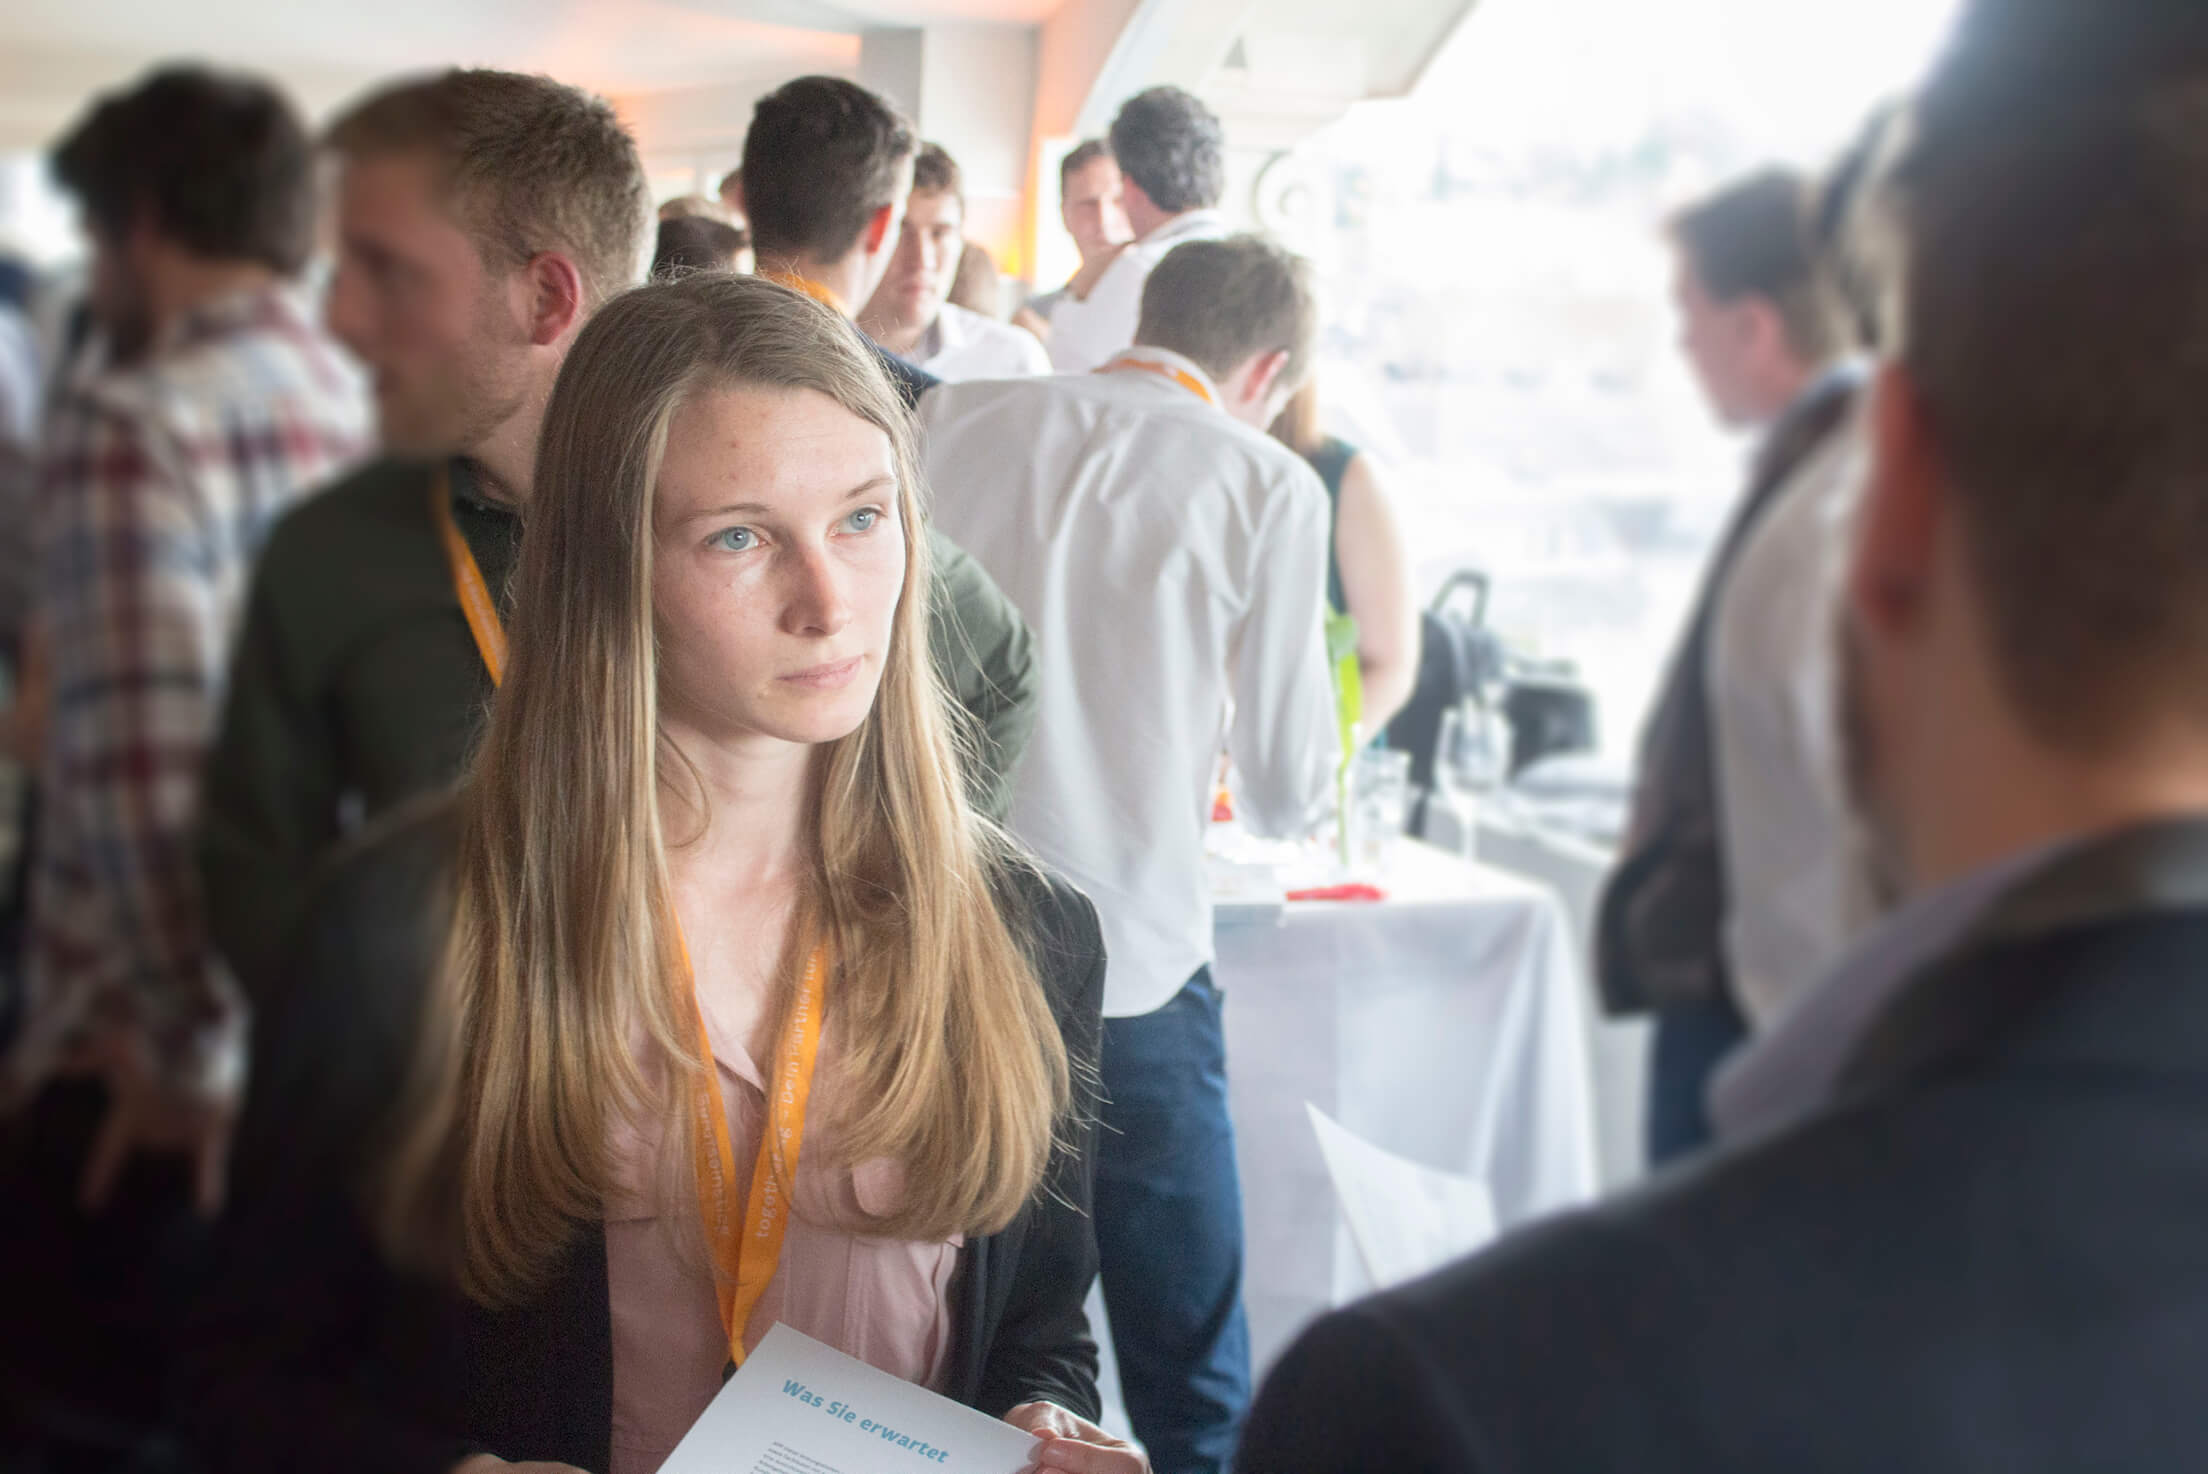 Sprungbrett-Event Zentralschweiz 2018